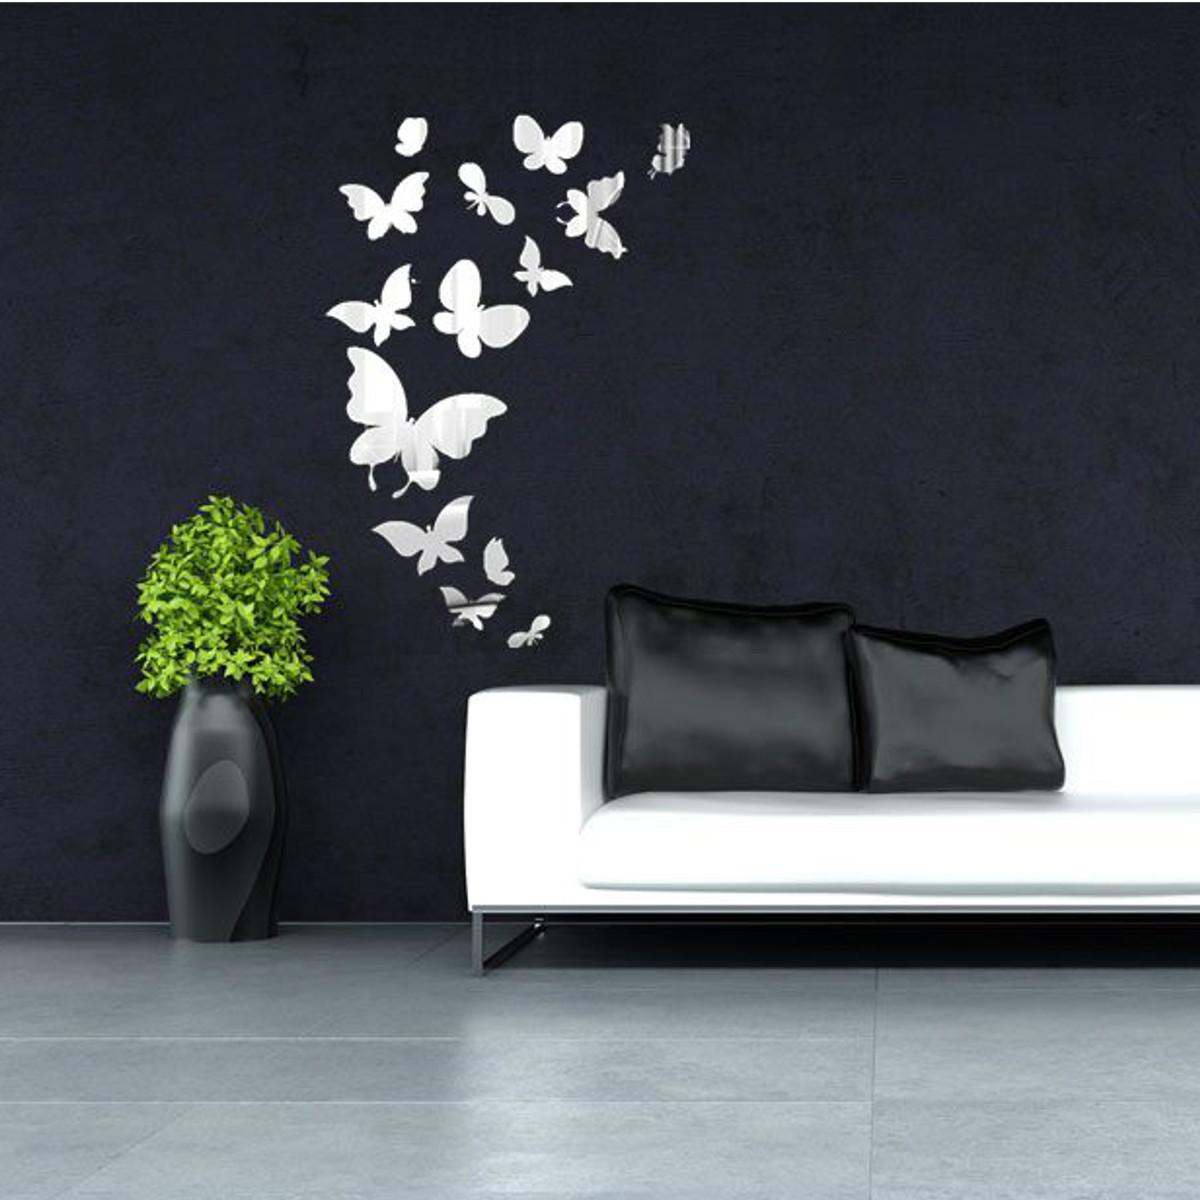 DIY 3D Mirror Fairy Star Butterfly Acrylic Removable Home ...